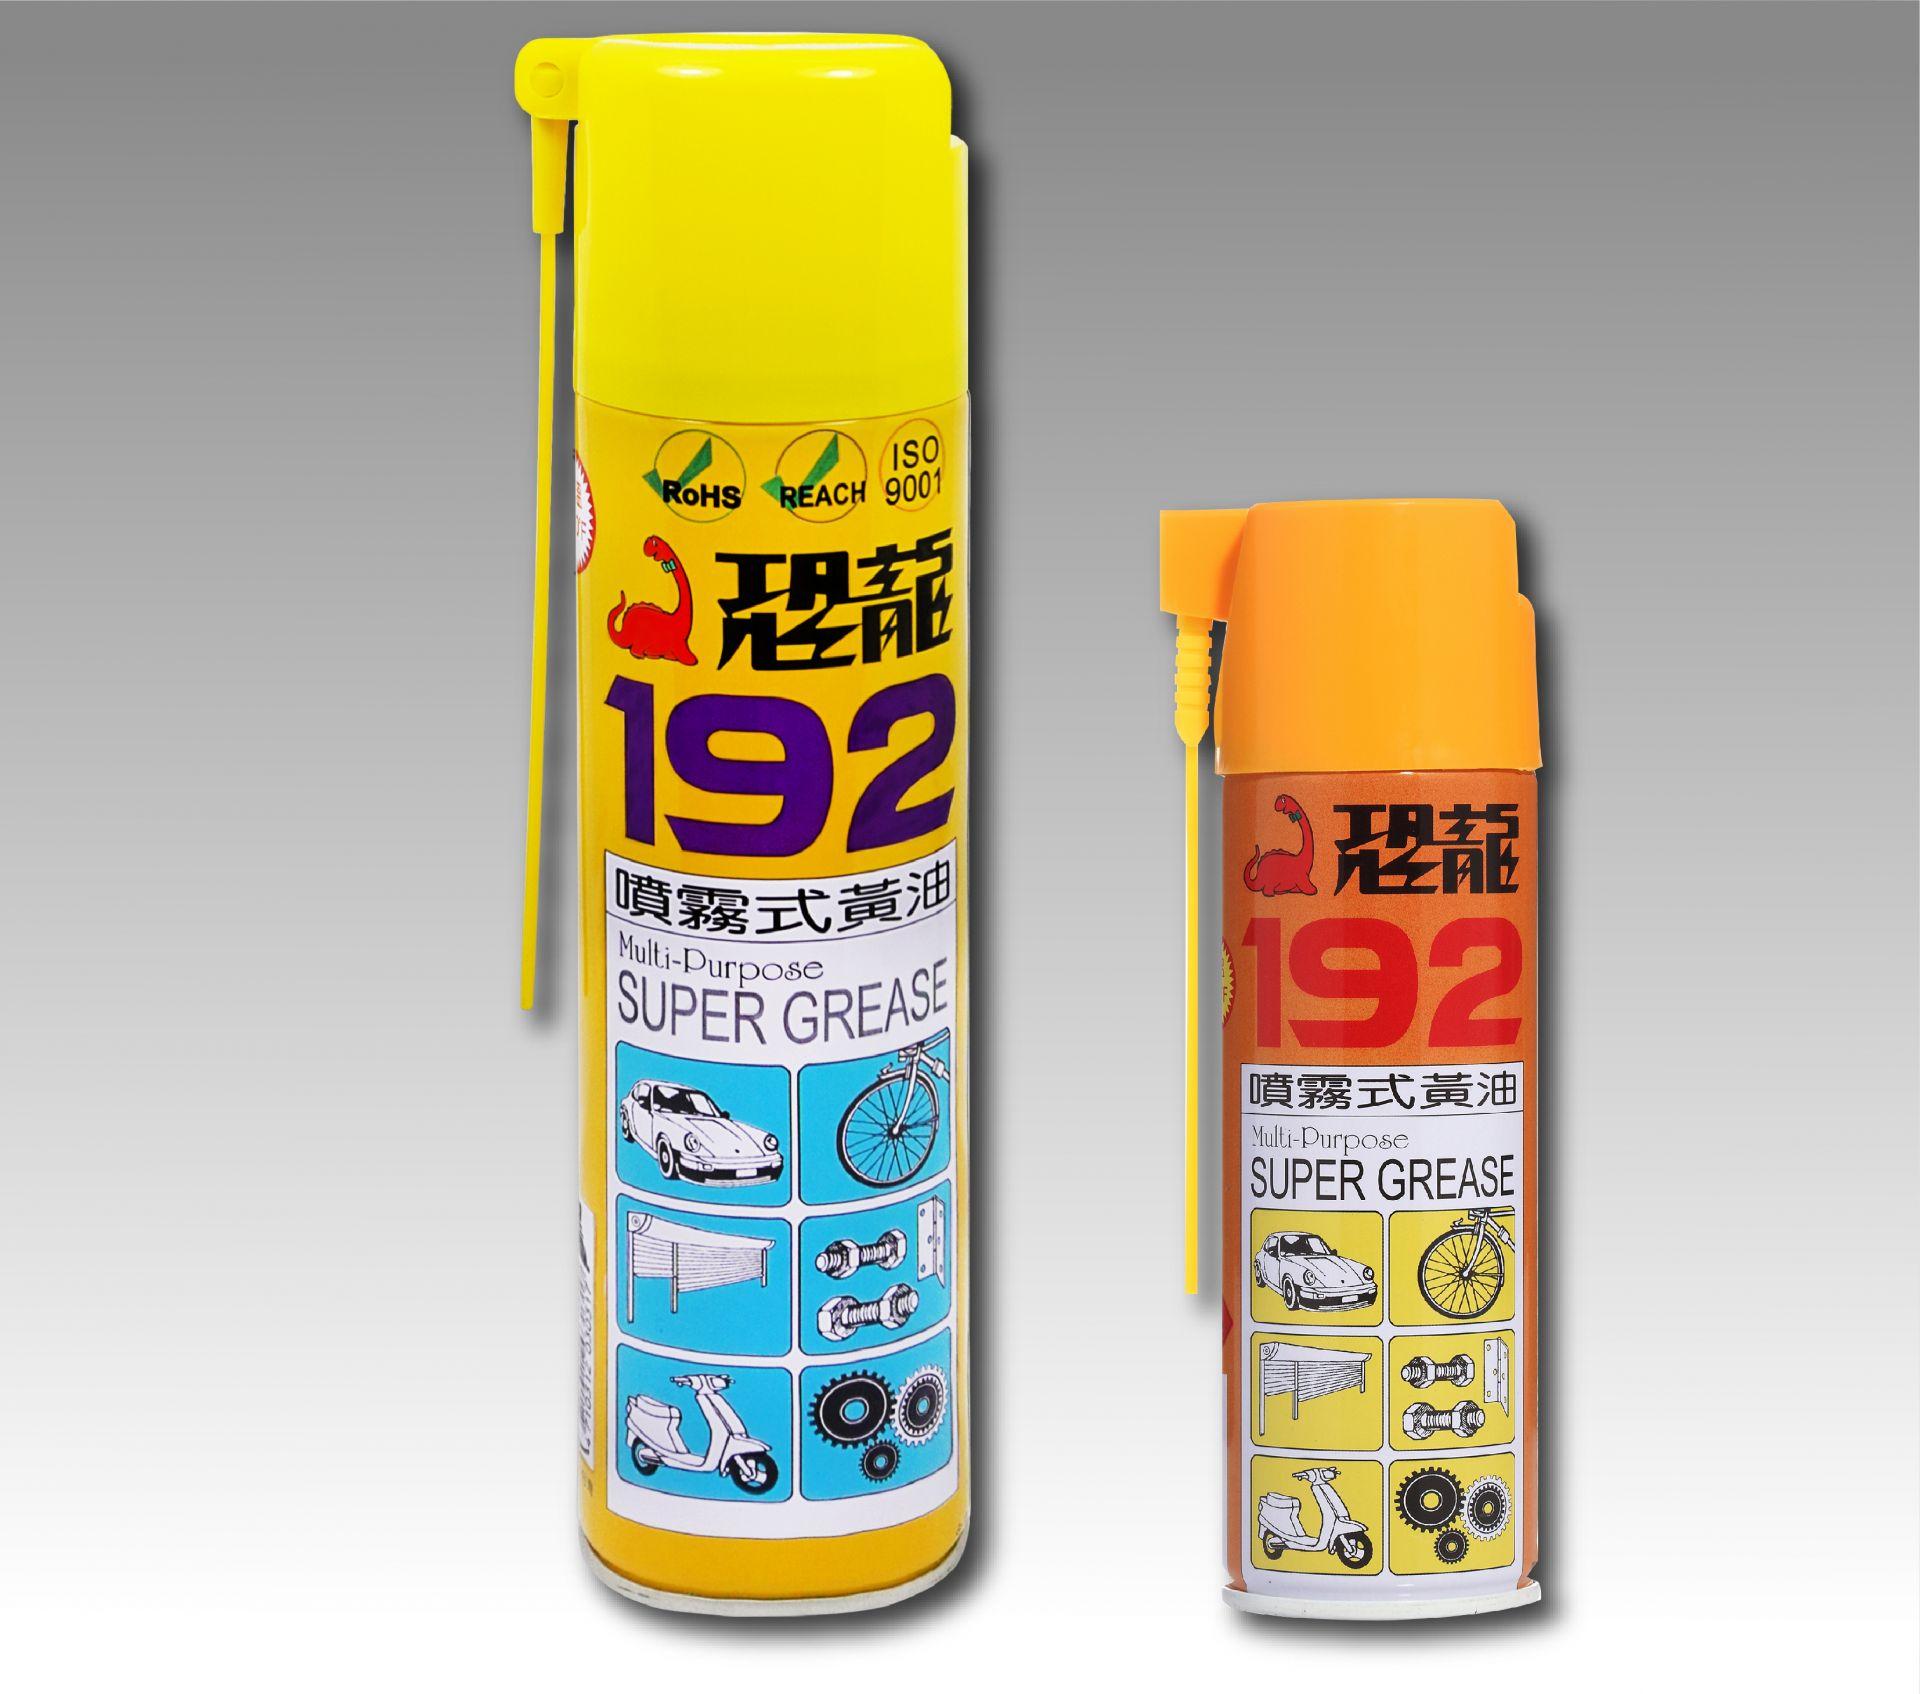 PUFF DINO 192 Spray Grease - 192 Spray Grease